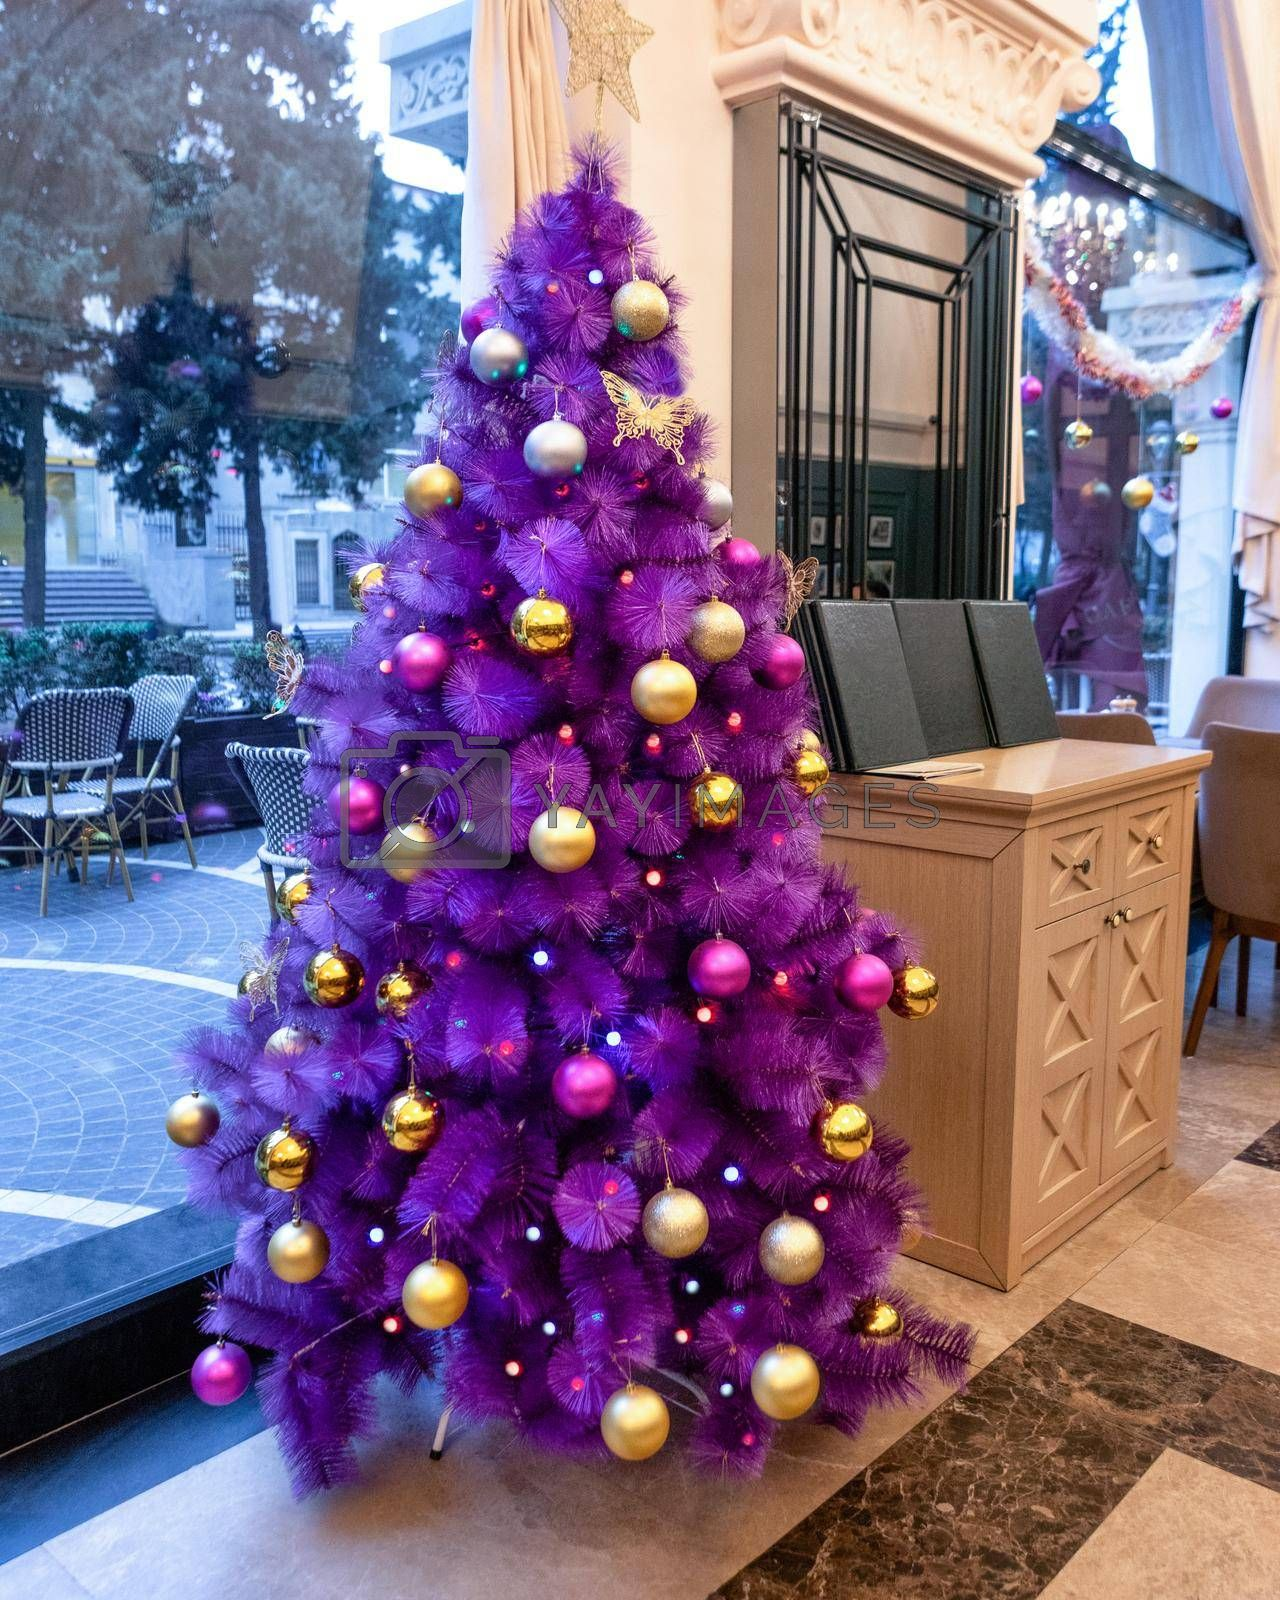 Purple Christmas tree in the restaurant